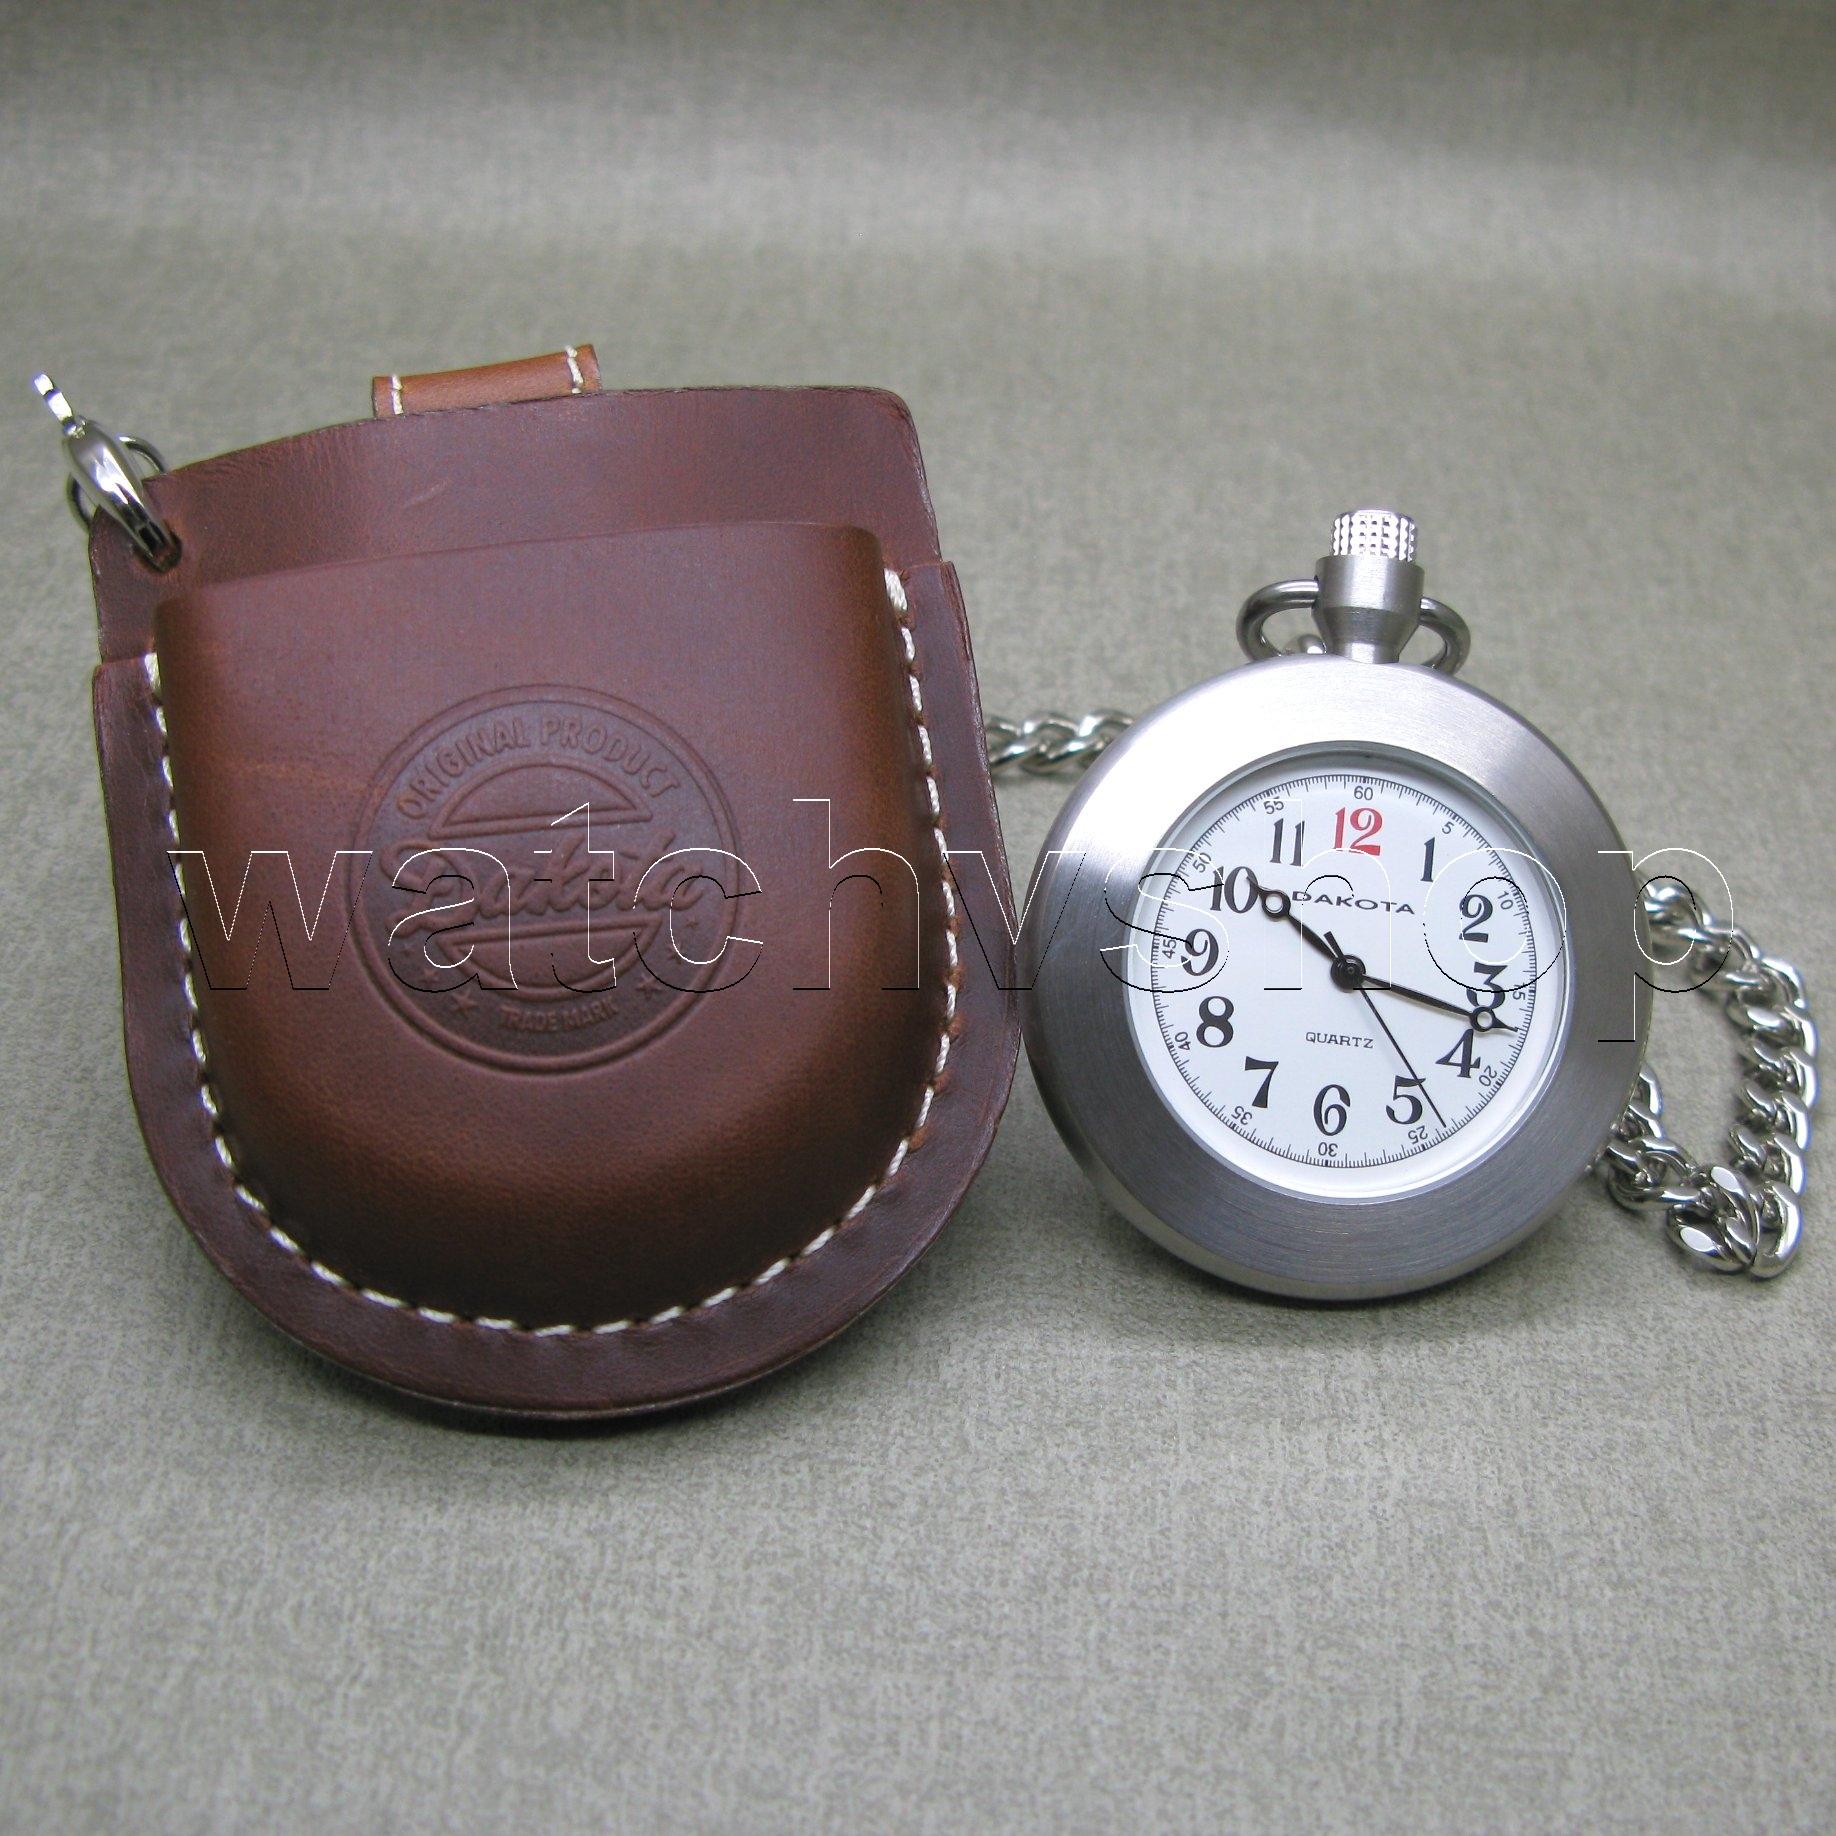 dakota stainless steel pocket leather pouch